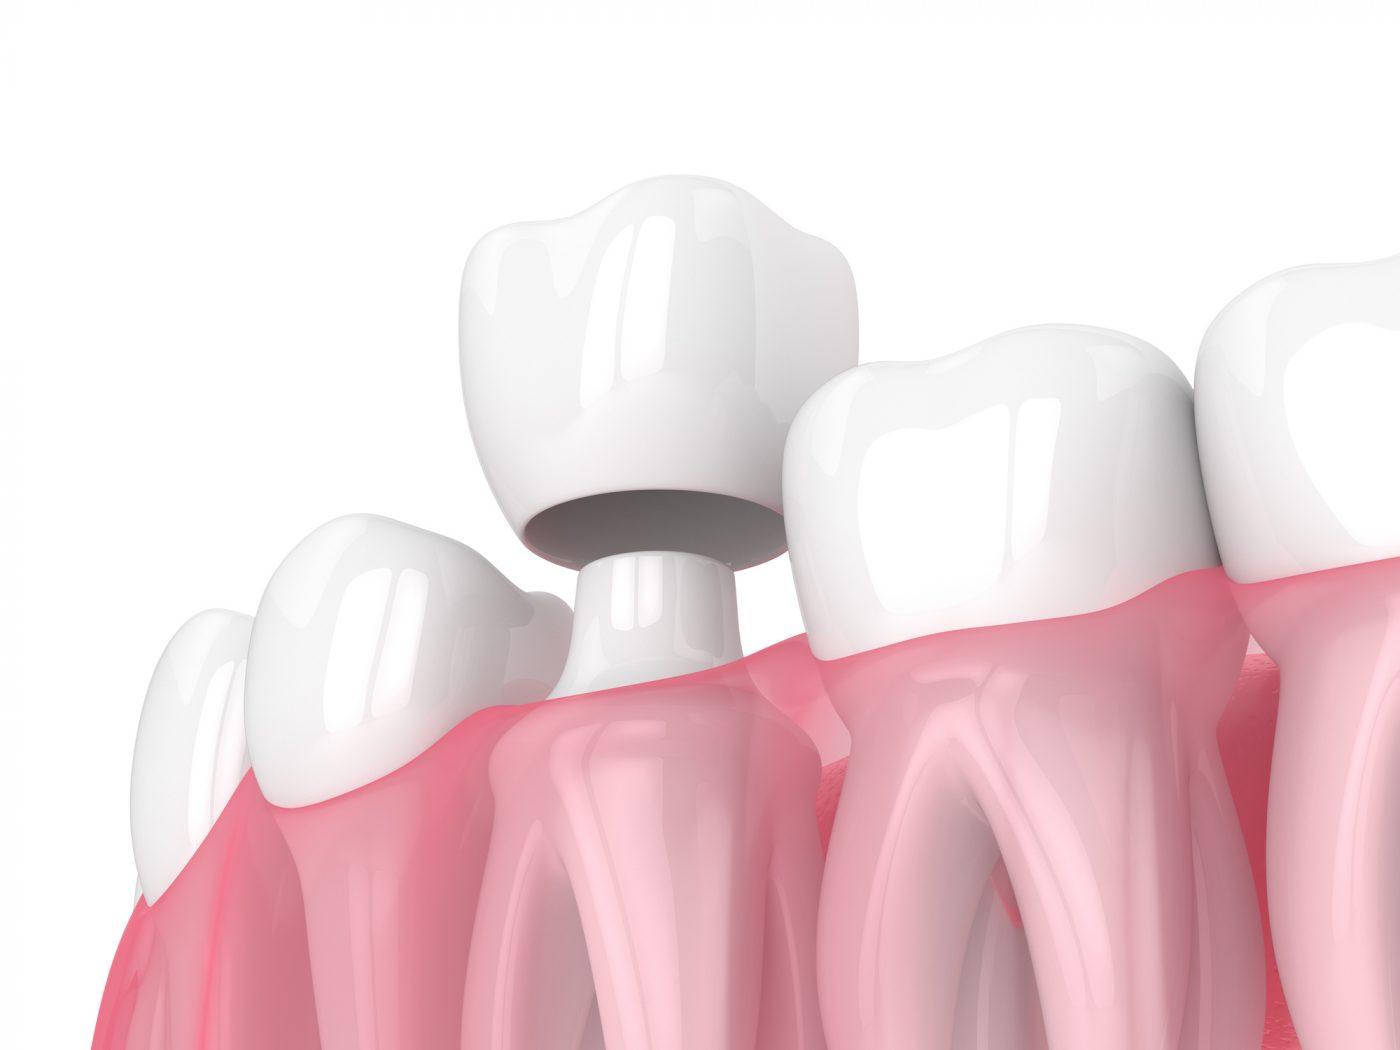 Lymebay Replacing Teeth Bridge